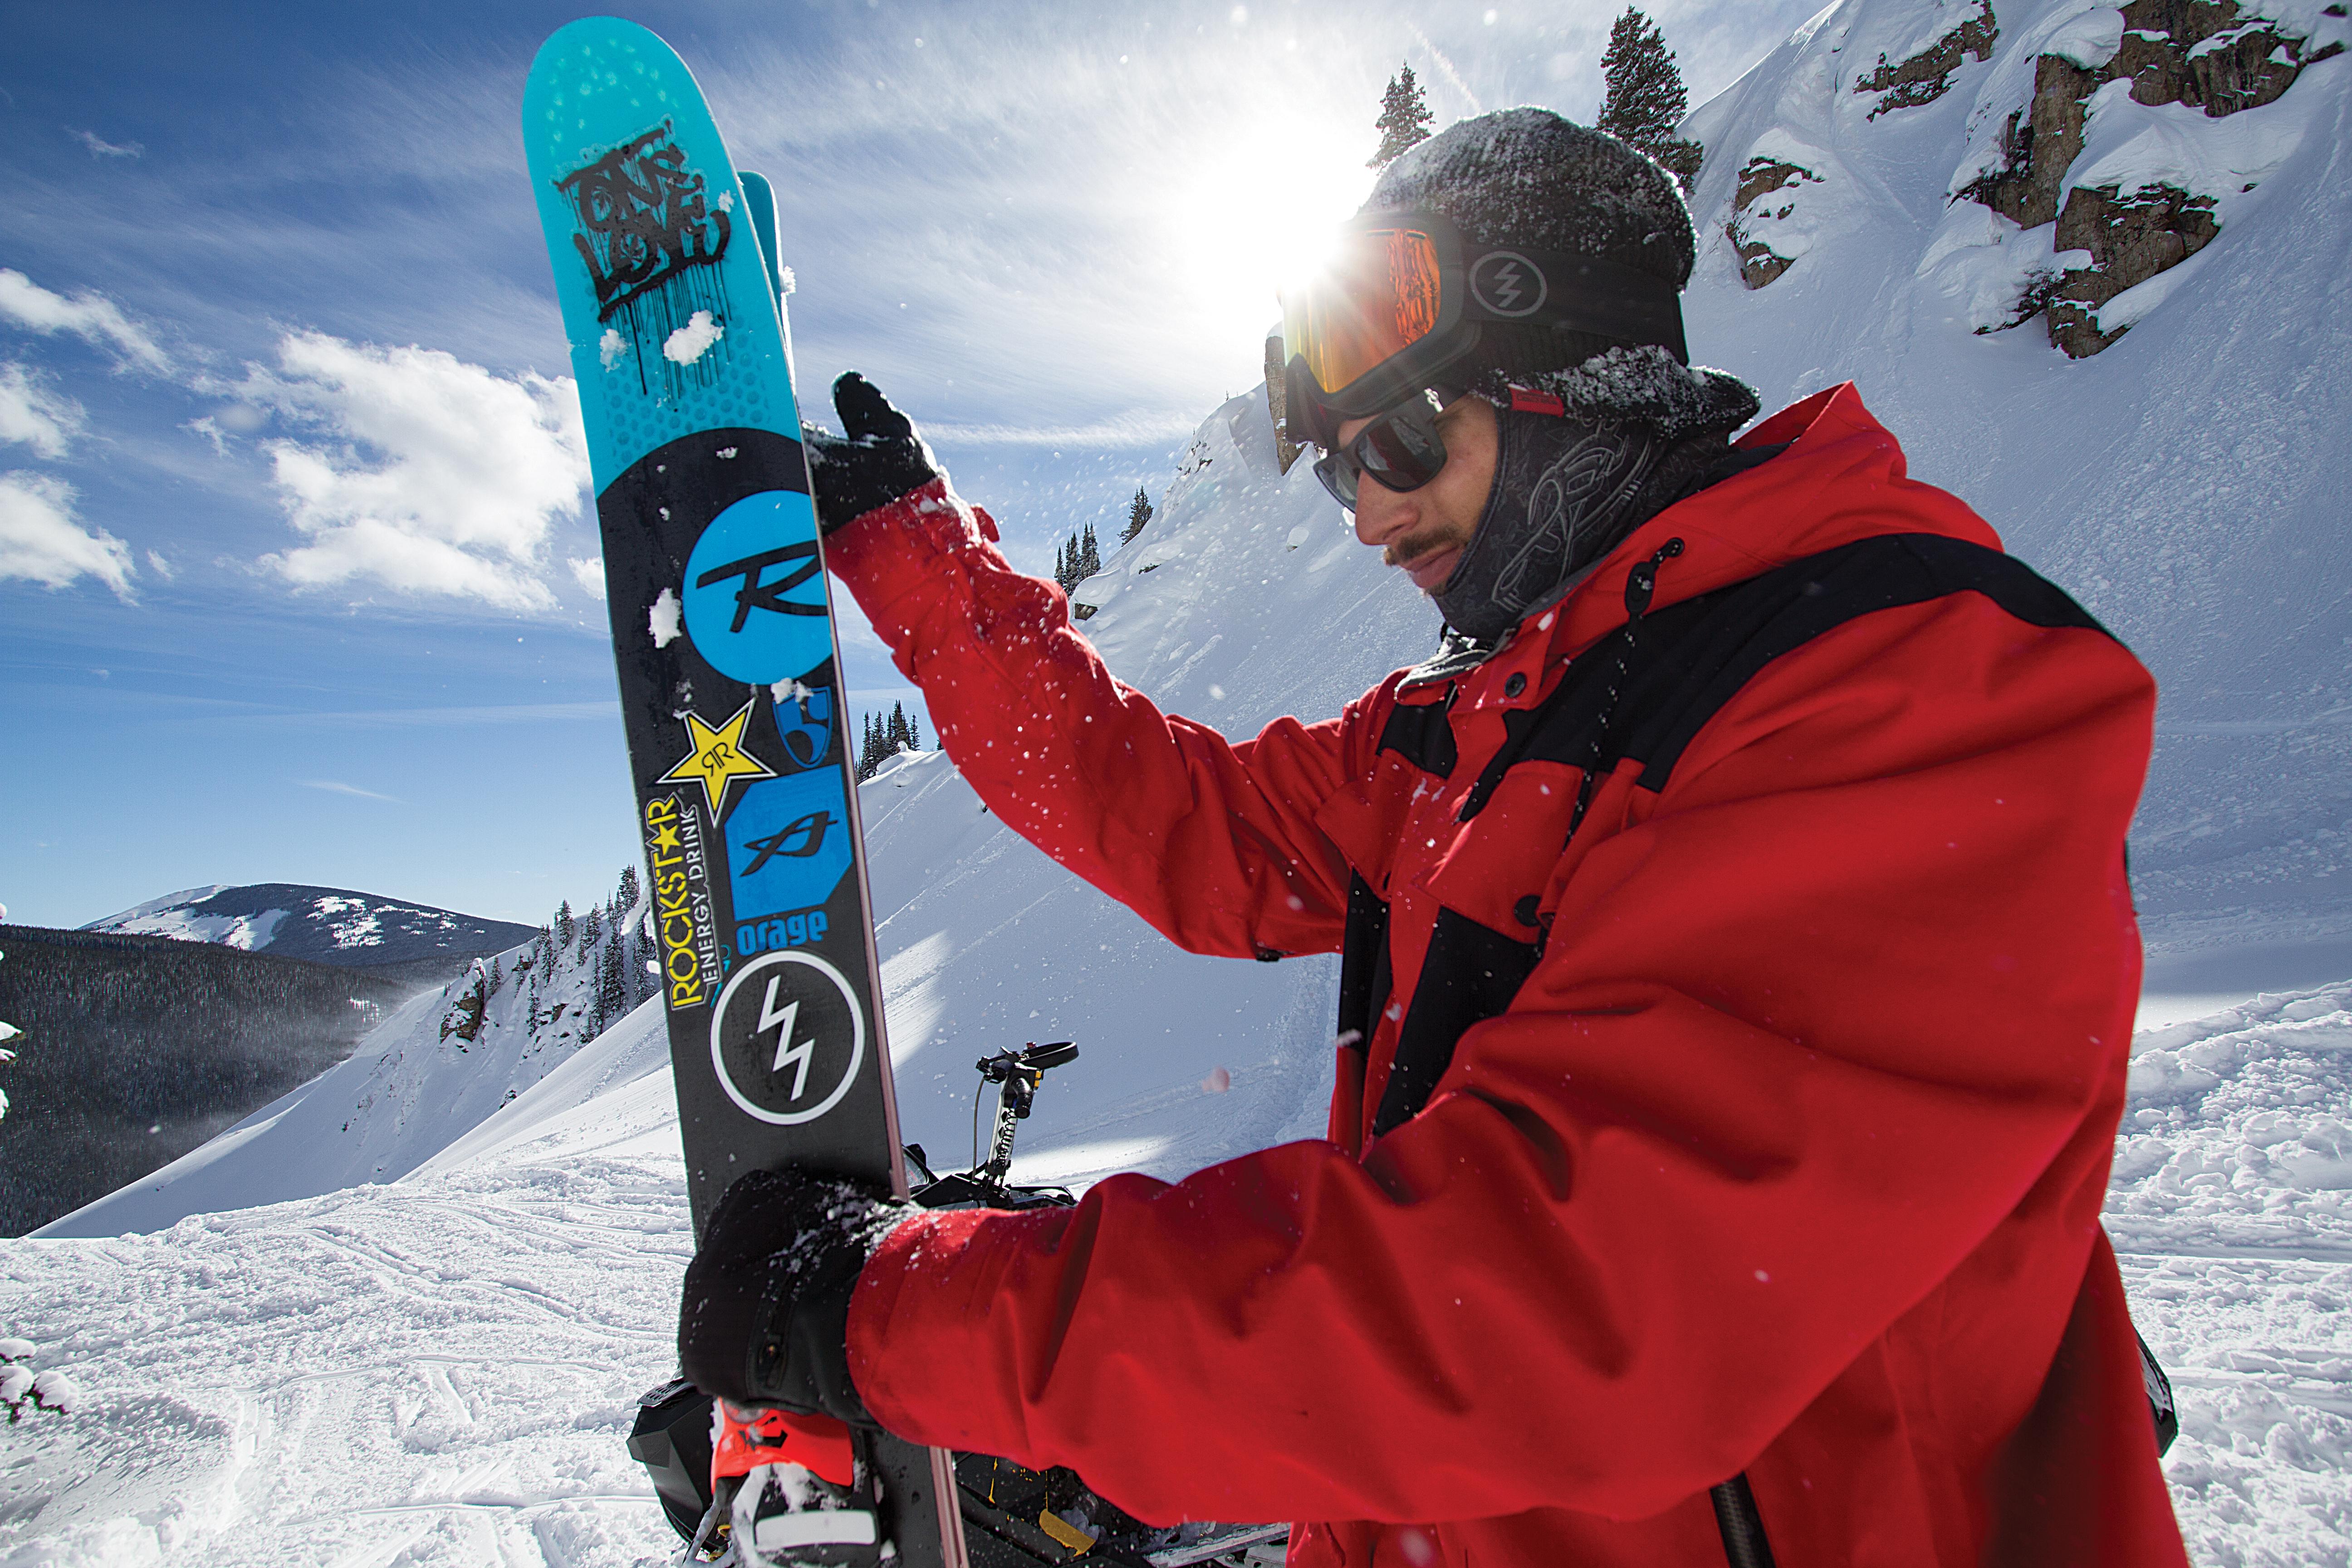 Chris Logan with his Rossignol Squad 7 skis